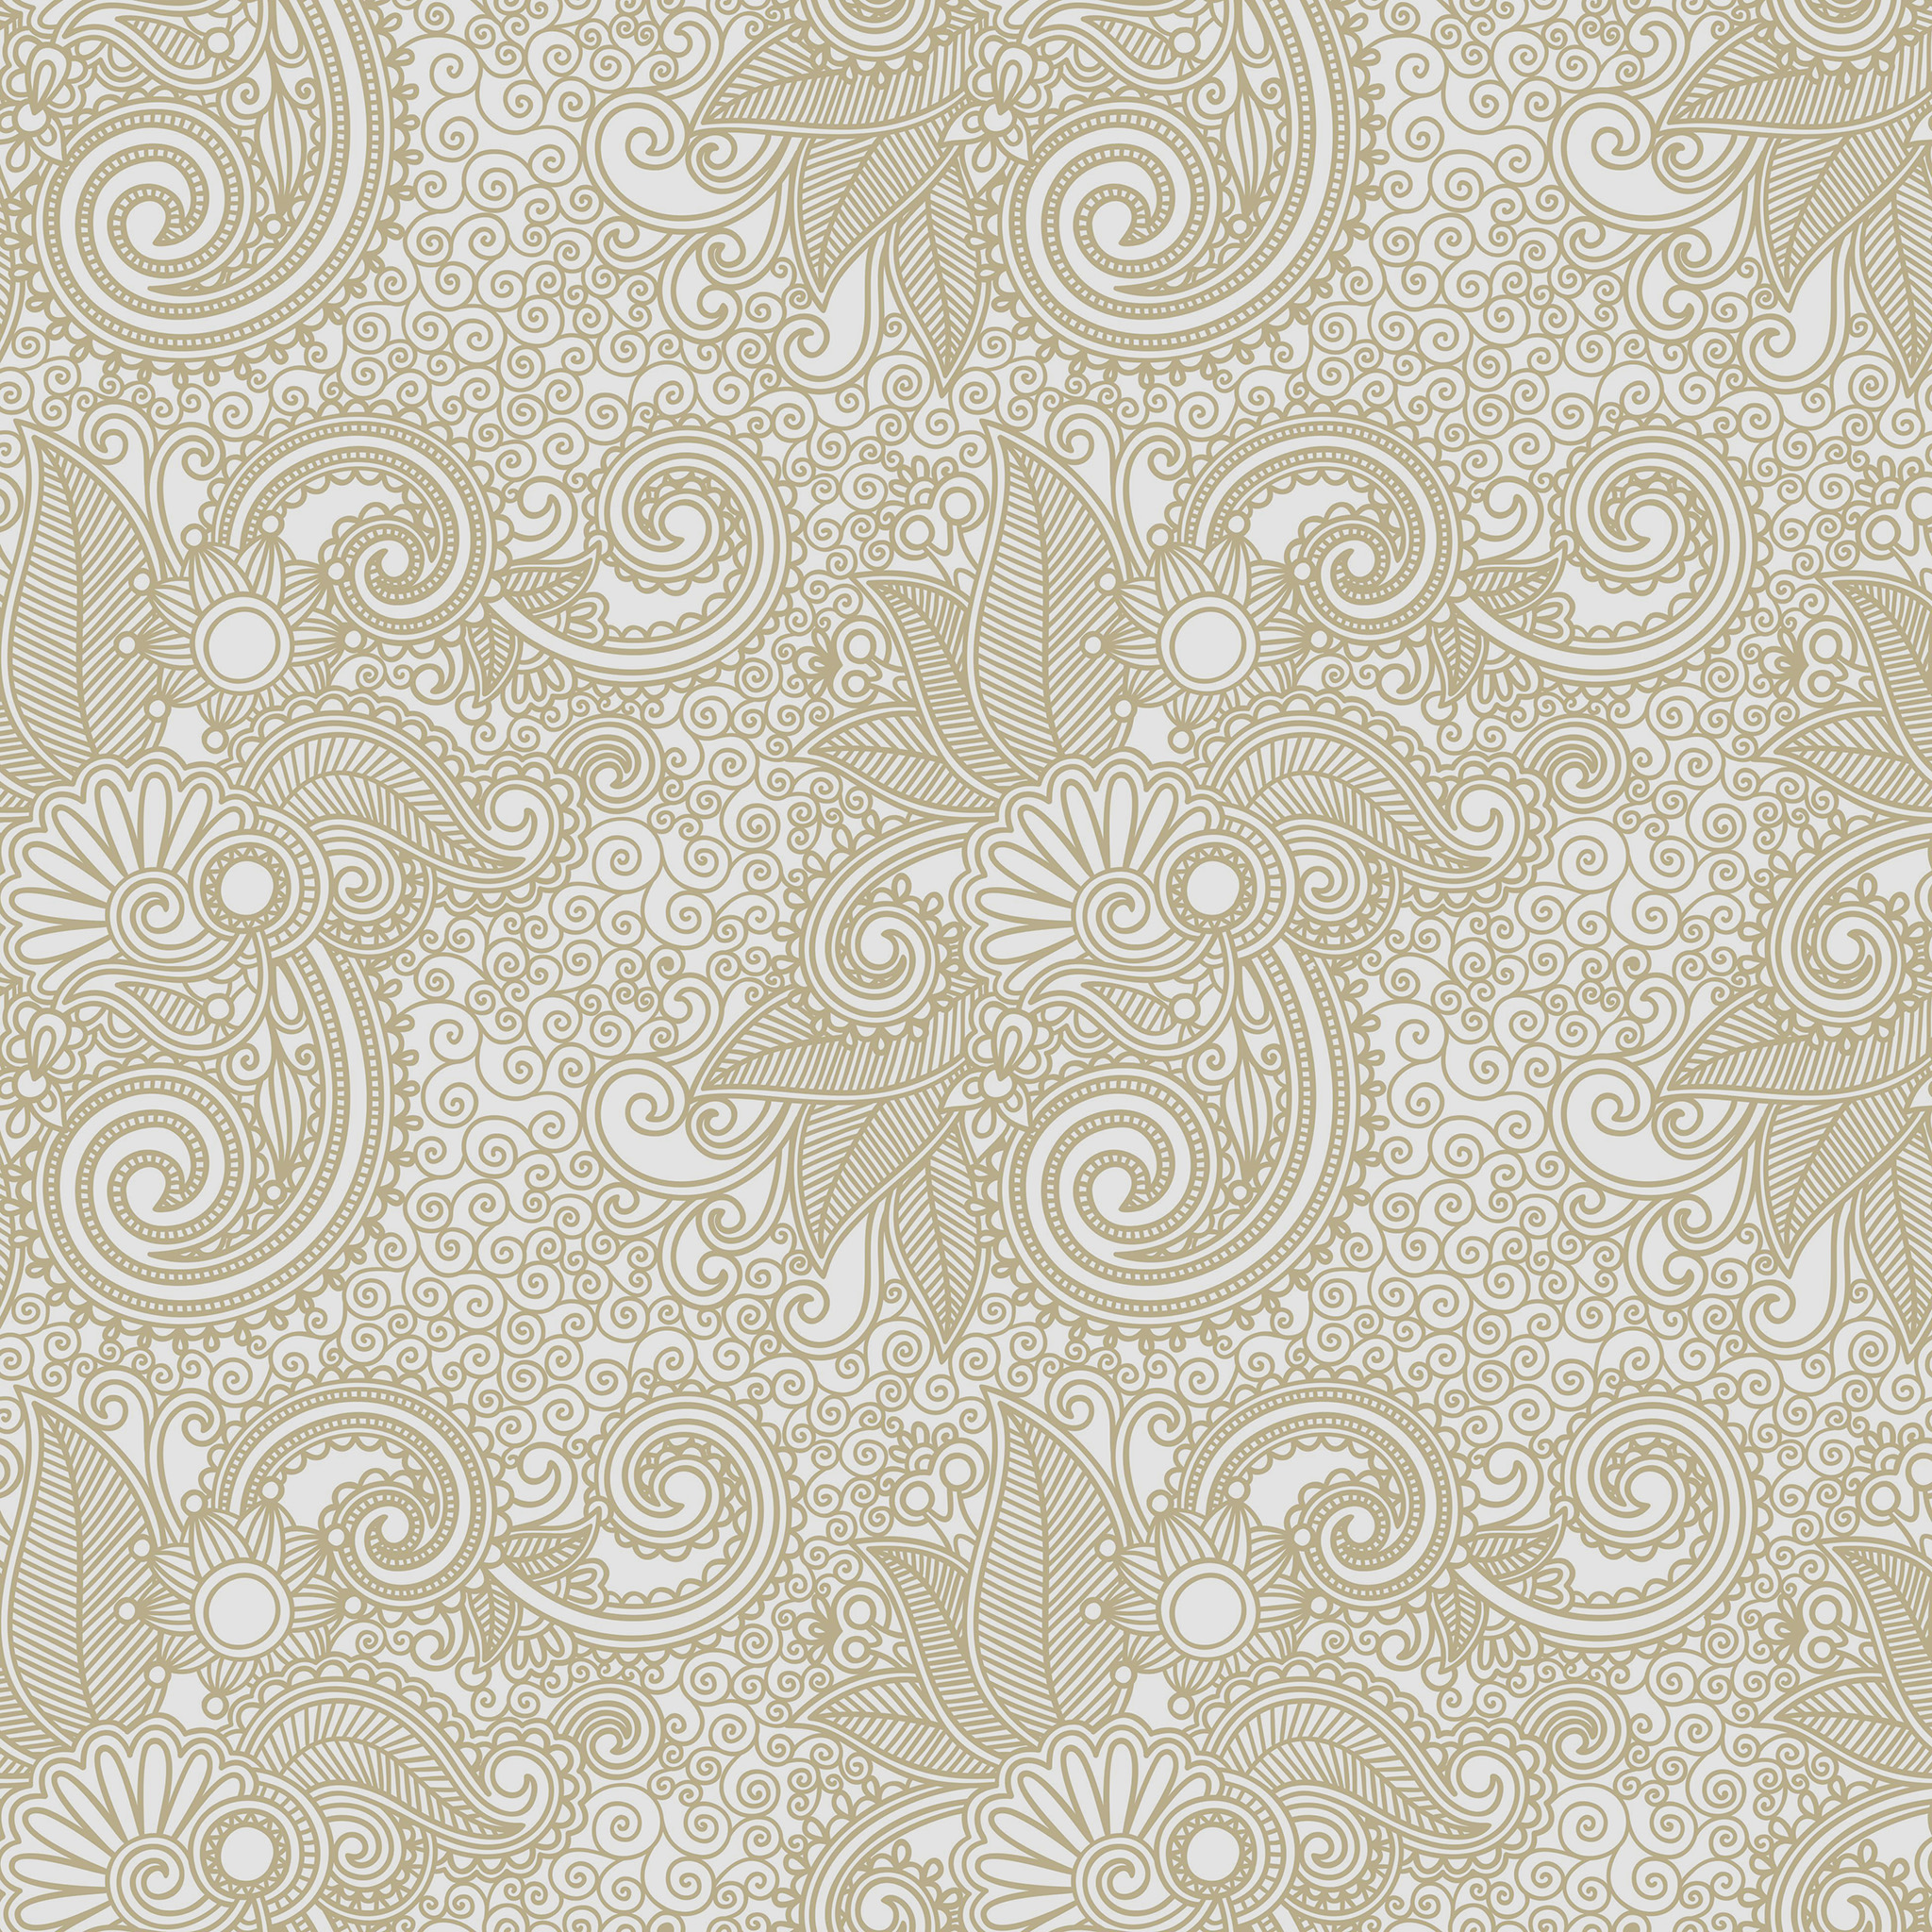 Vk27 Wallpaper Design Flower Line Pattern Papers